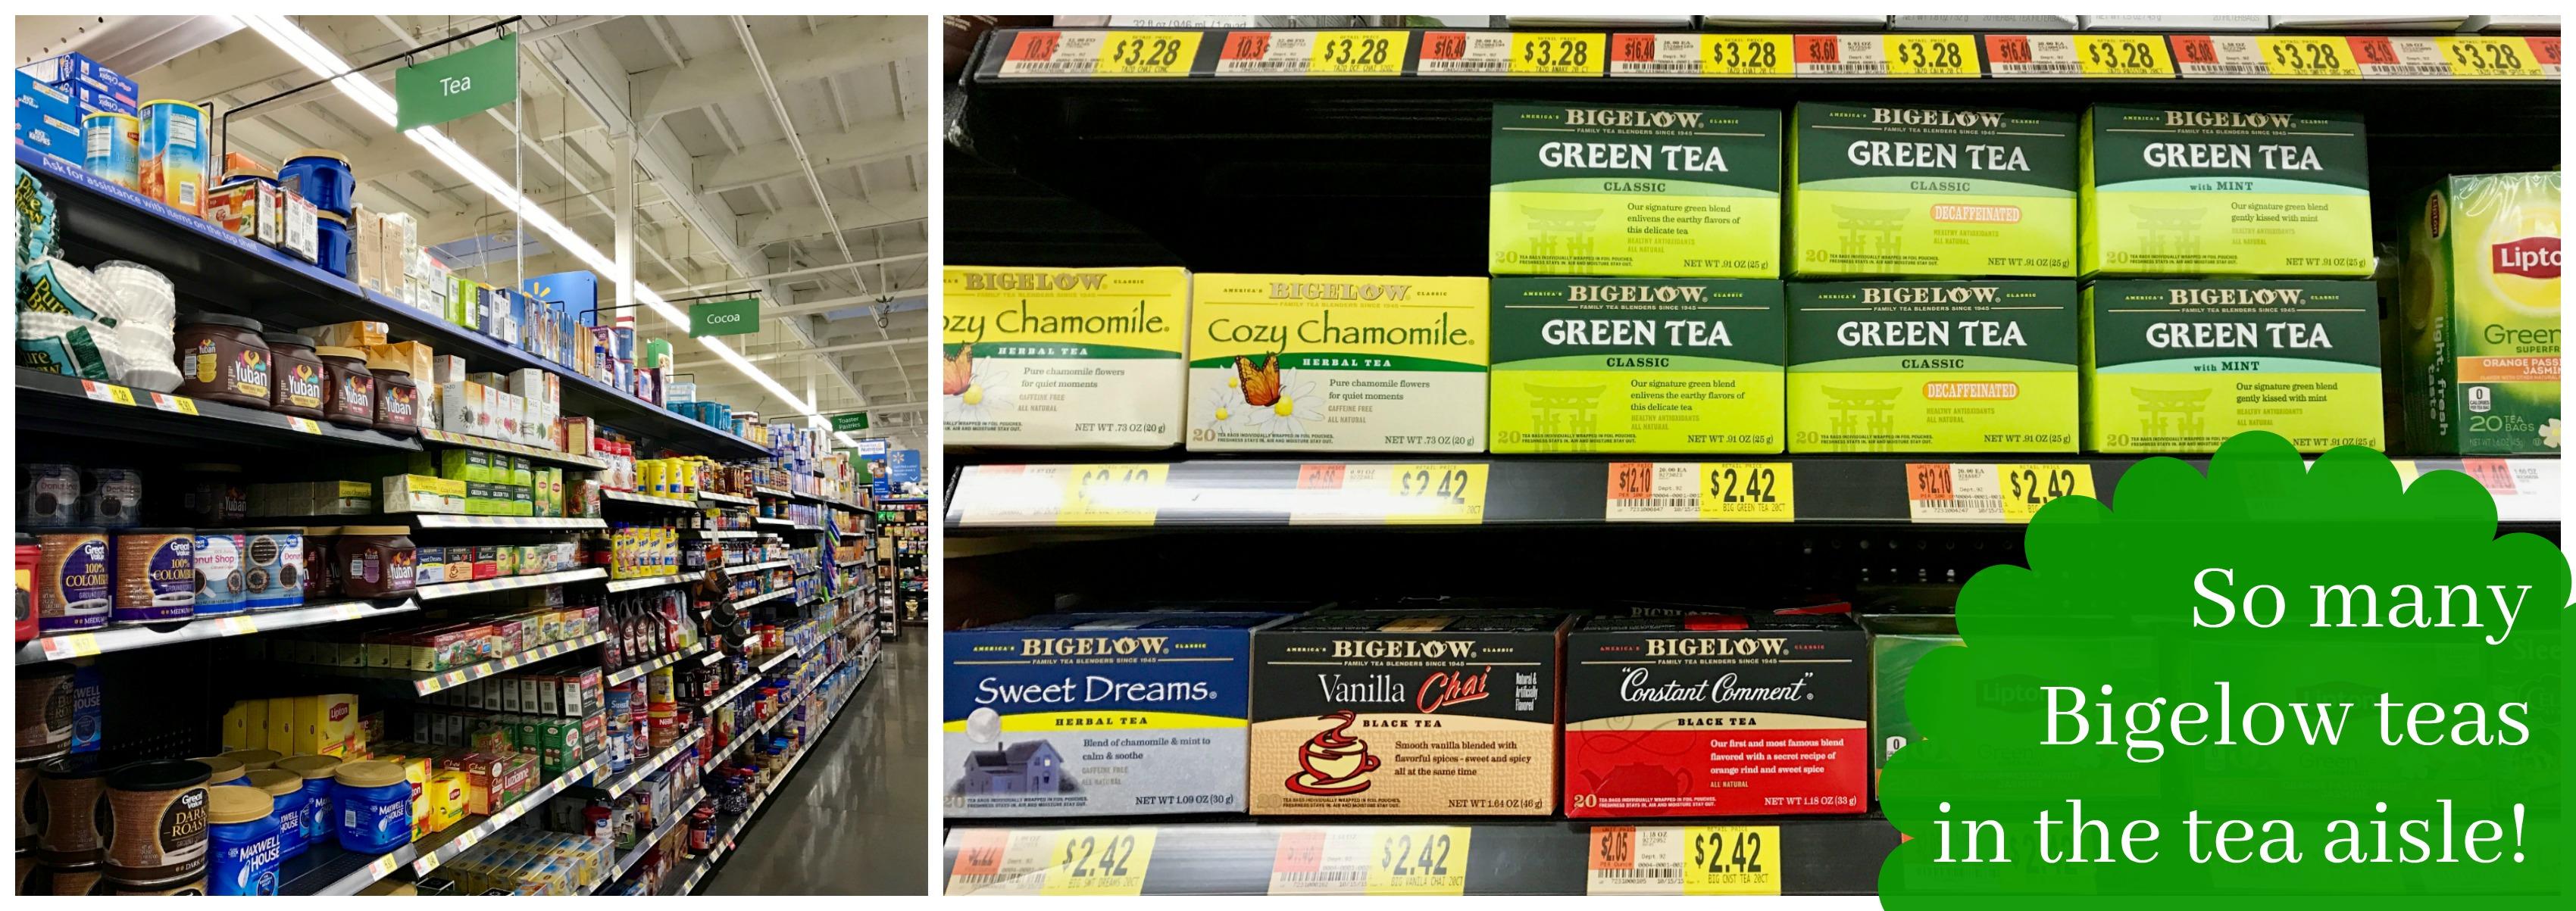 So many Bigelow teas in the tea aisle!